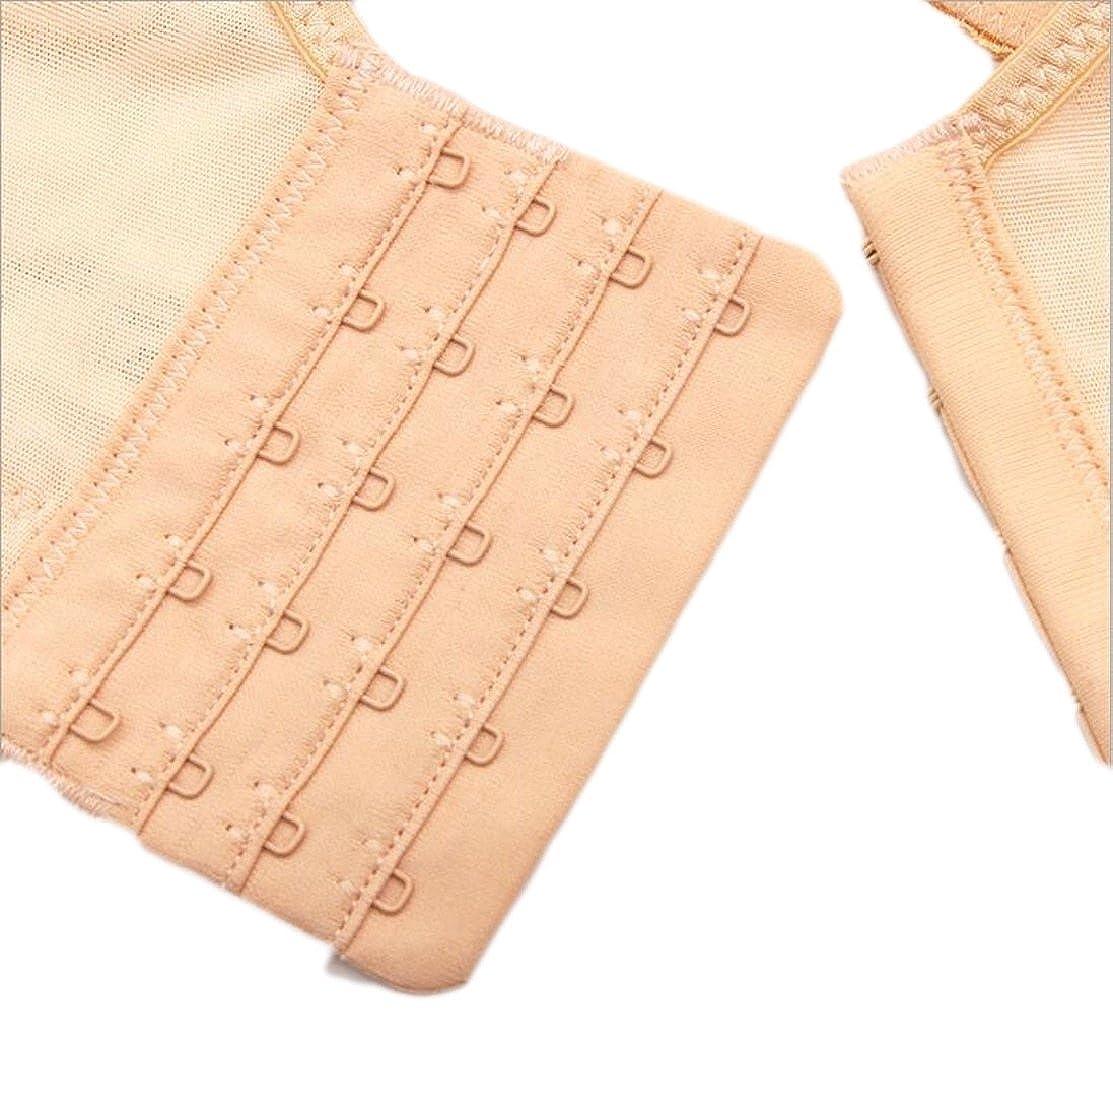 Fly Year-uk Women Plus Size Push up Lace Bra Breathable Thin Everyday Bra